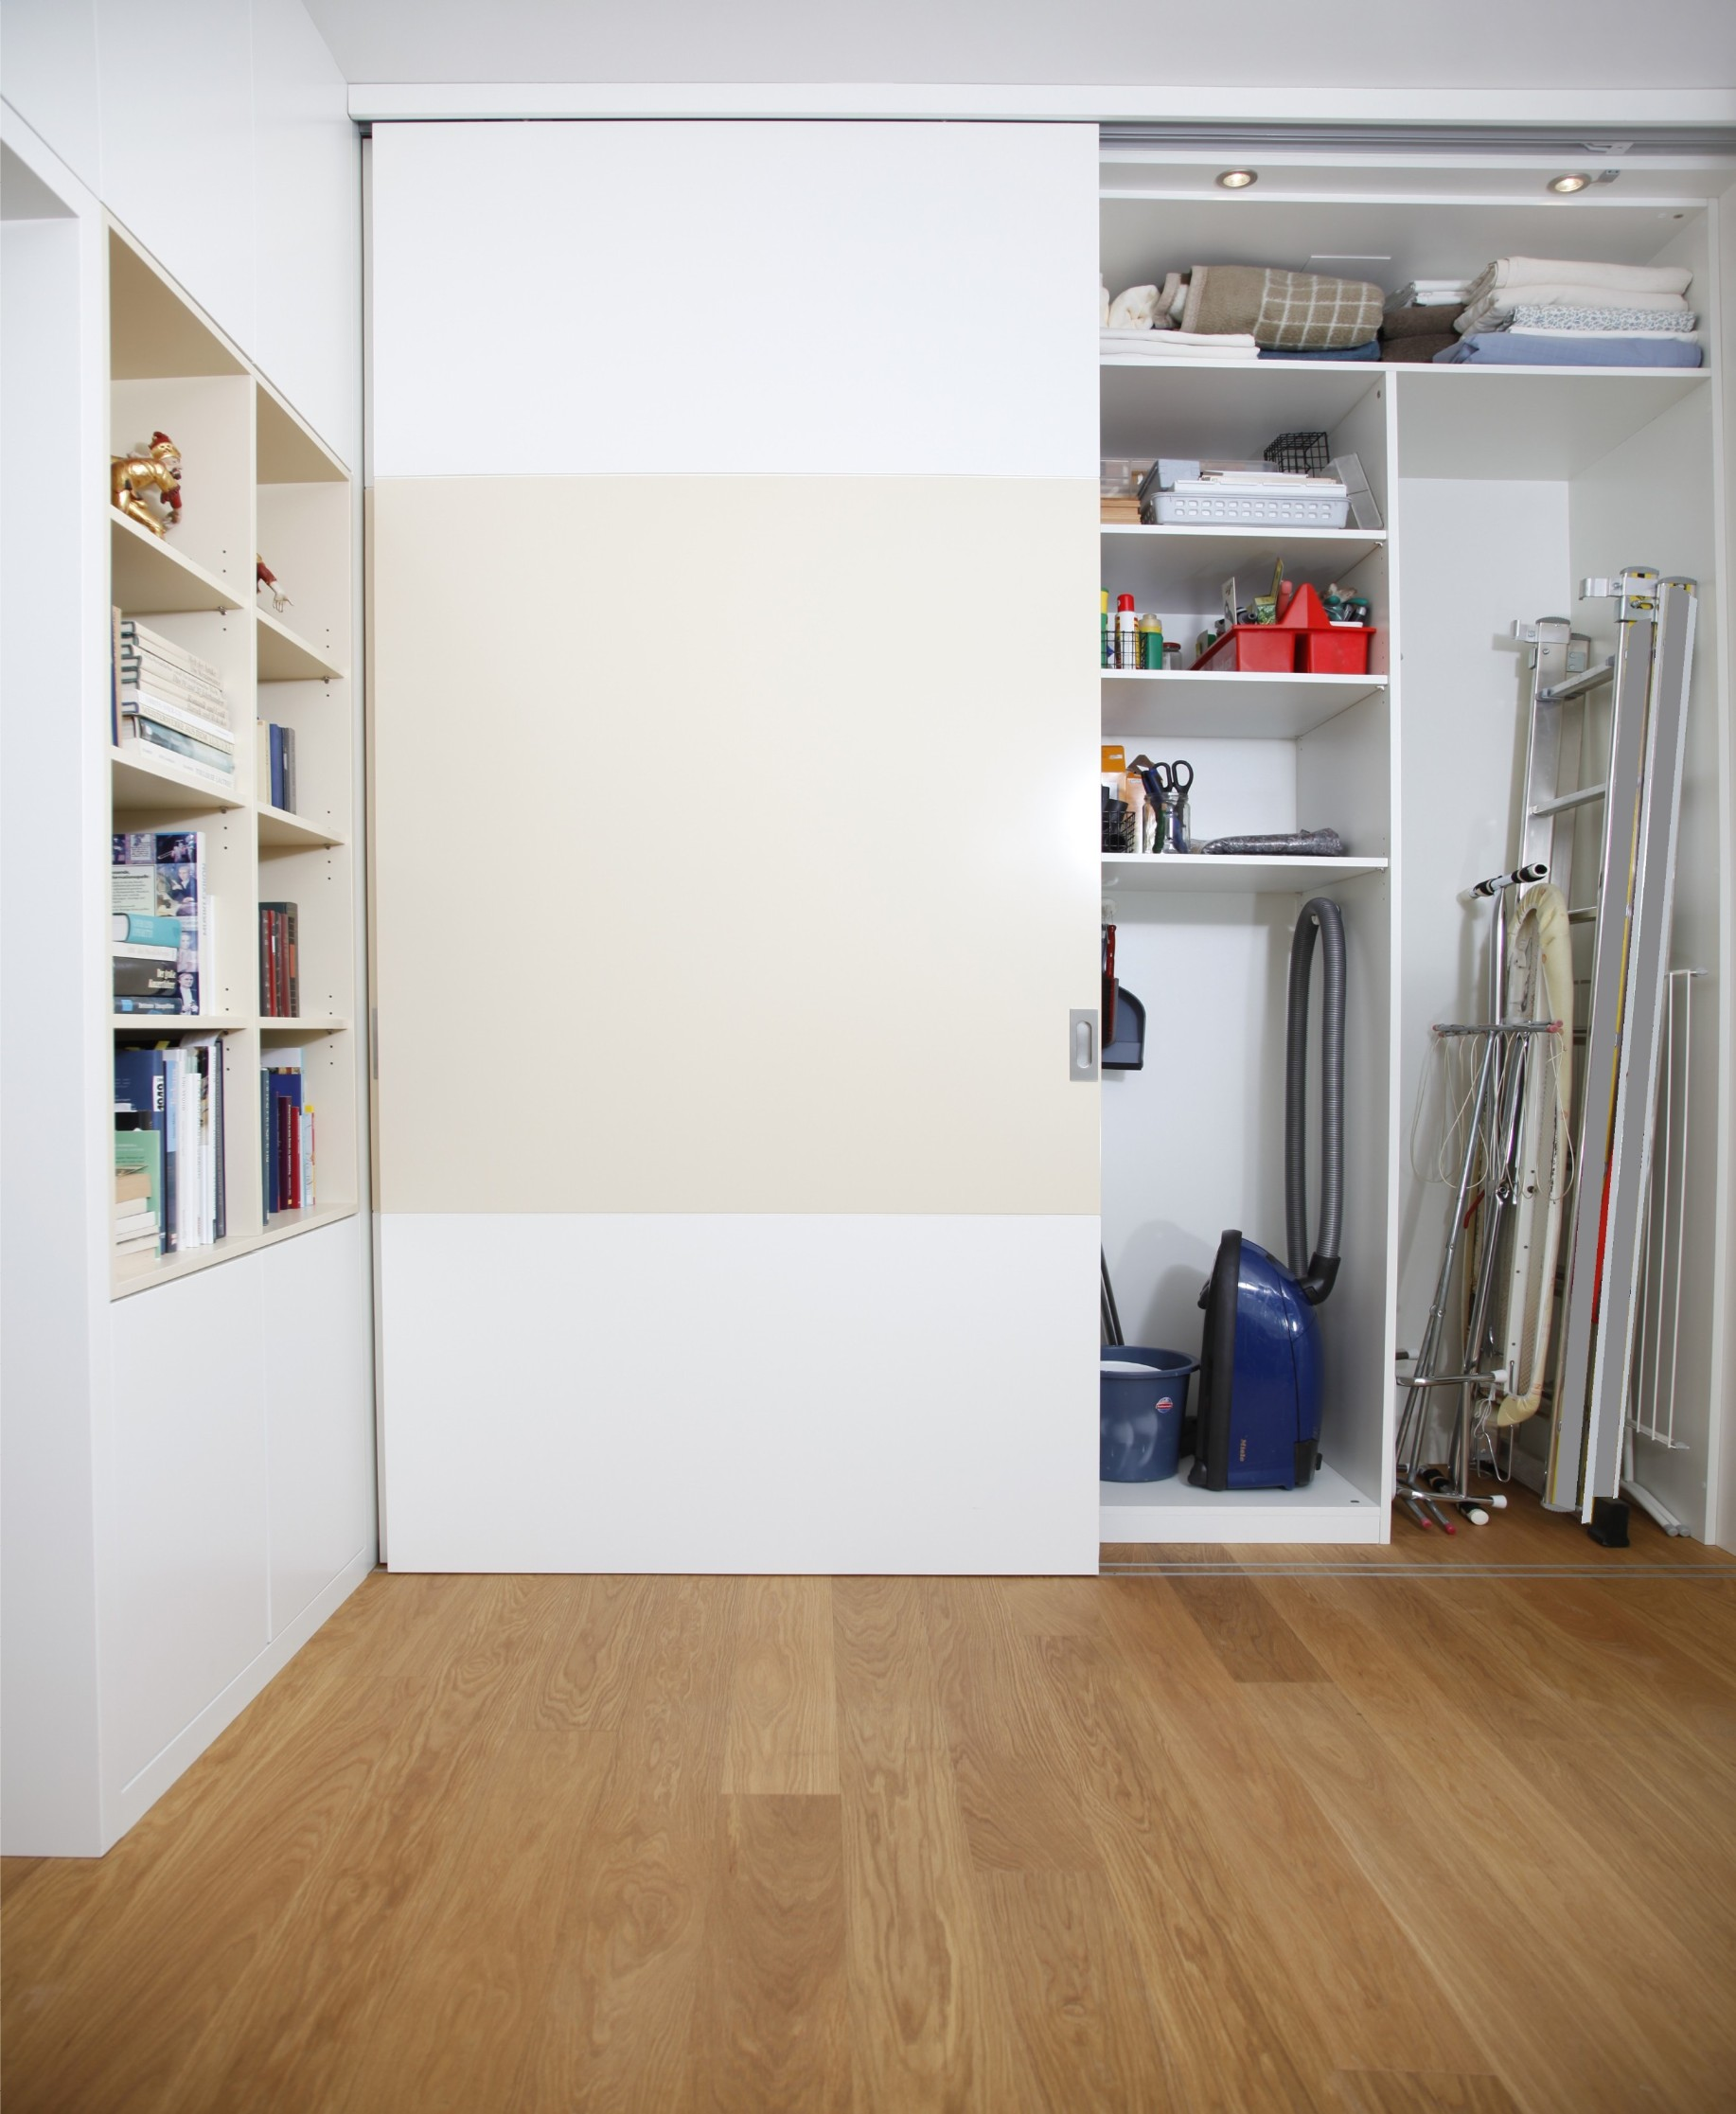 januar 2013 eswerderaum. Black Bedroom Furniture Sets. Home Design Ideas